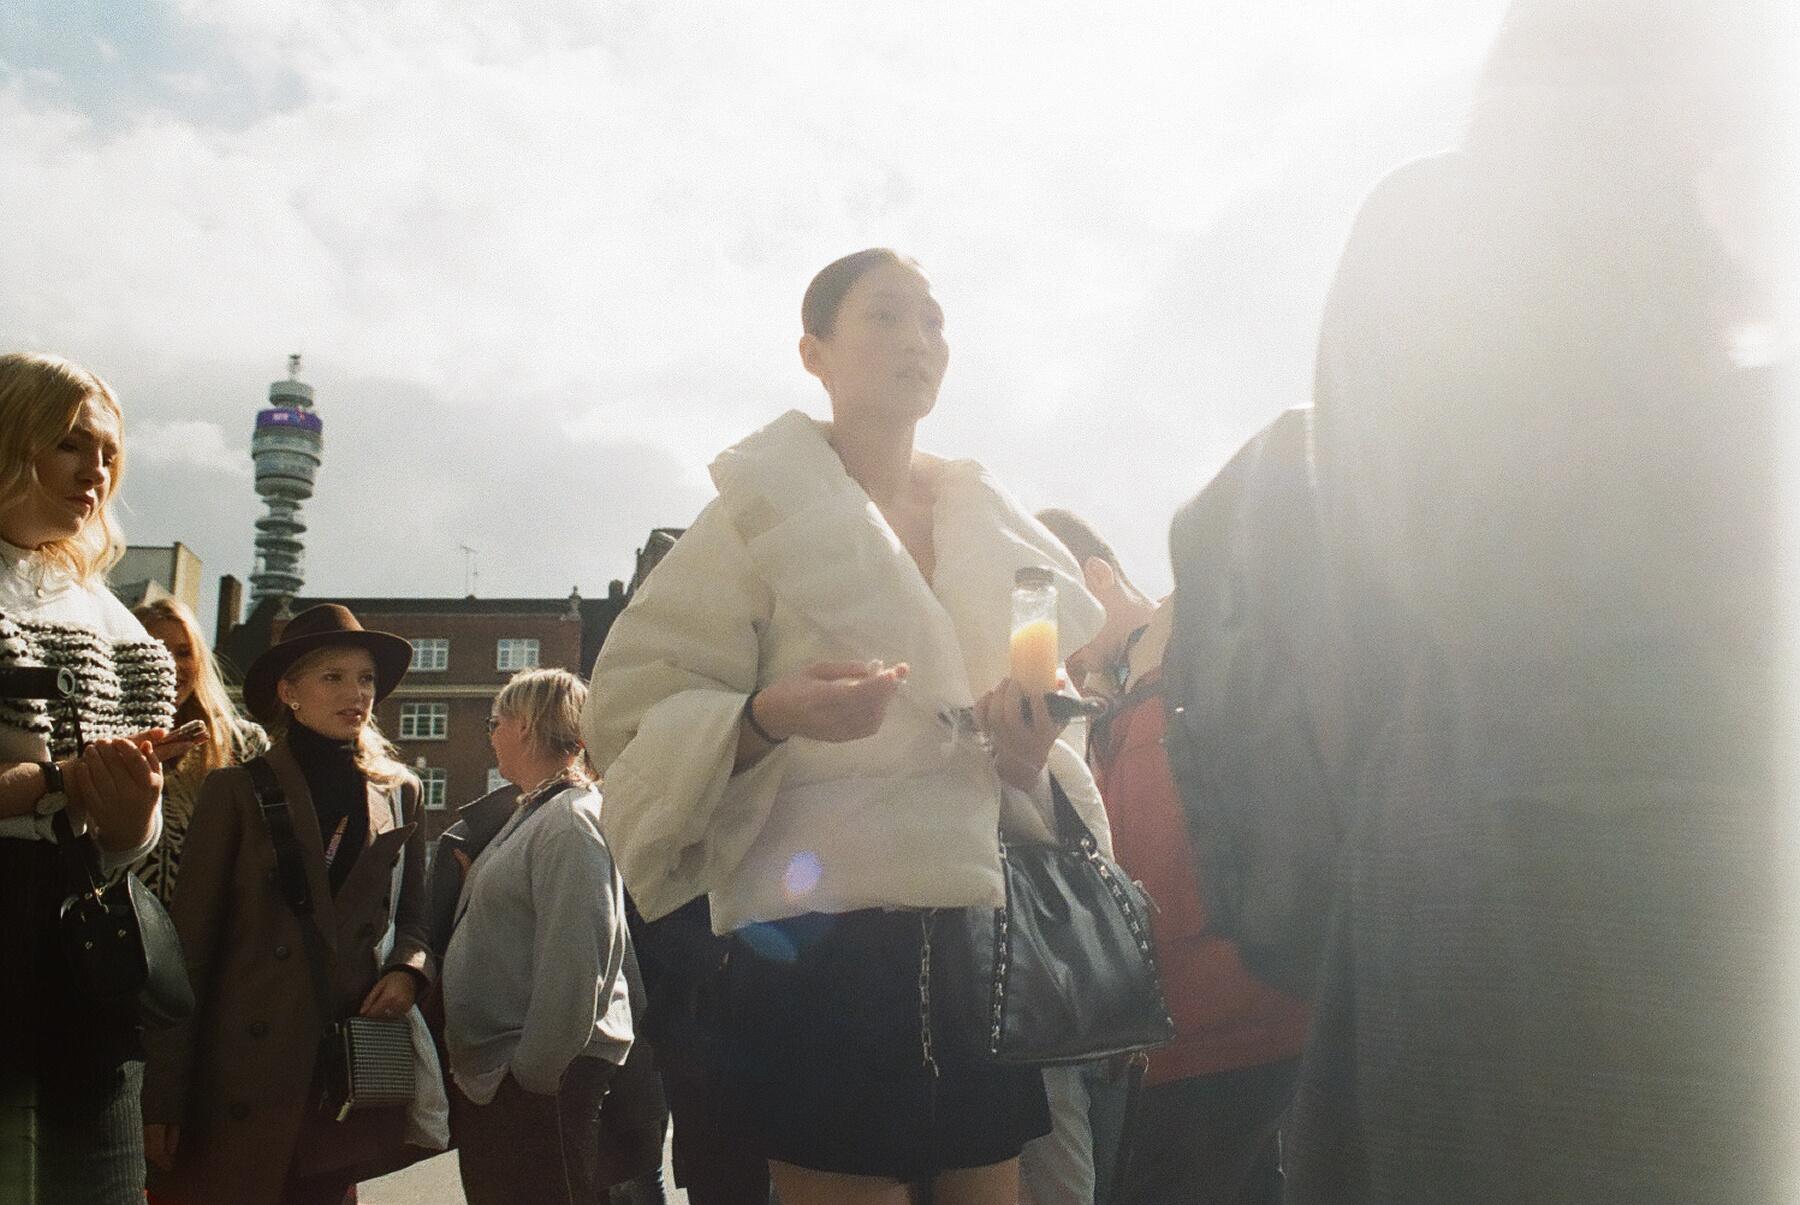 London Fashion Week 35mm.jpg